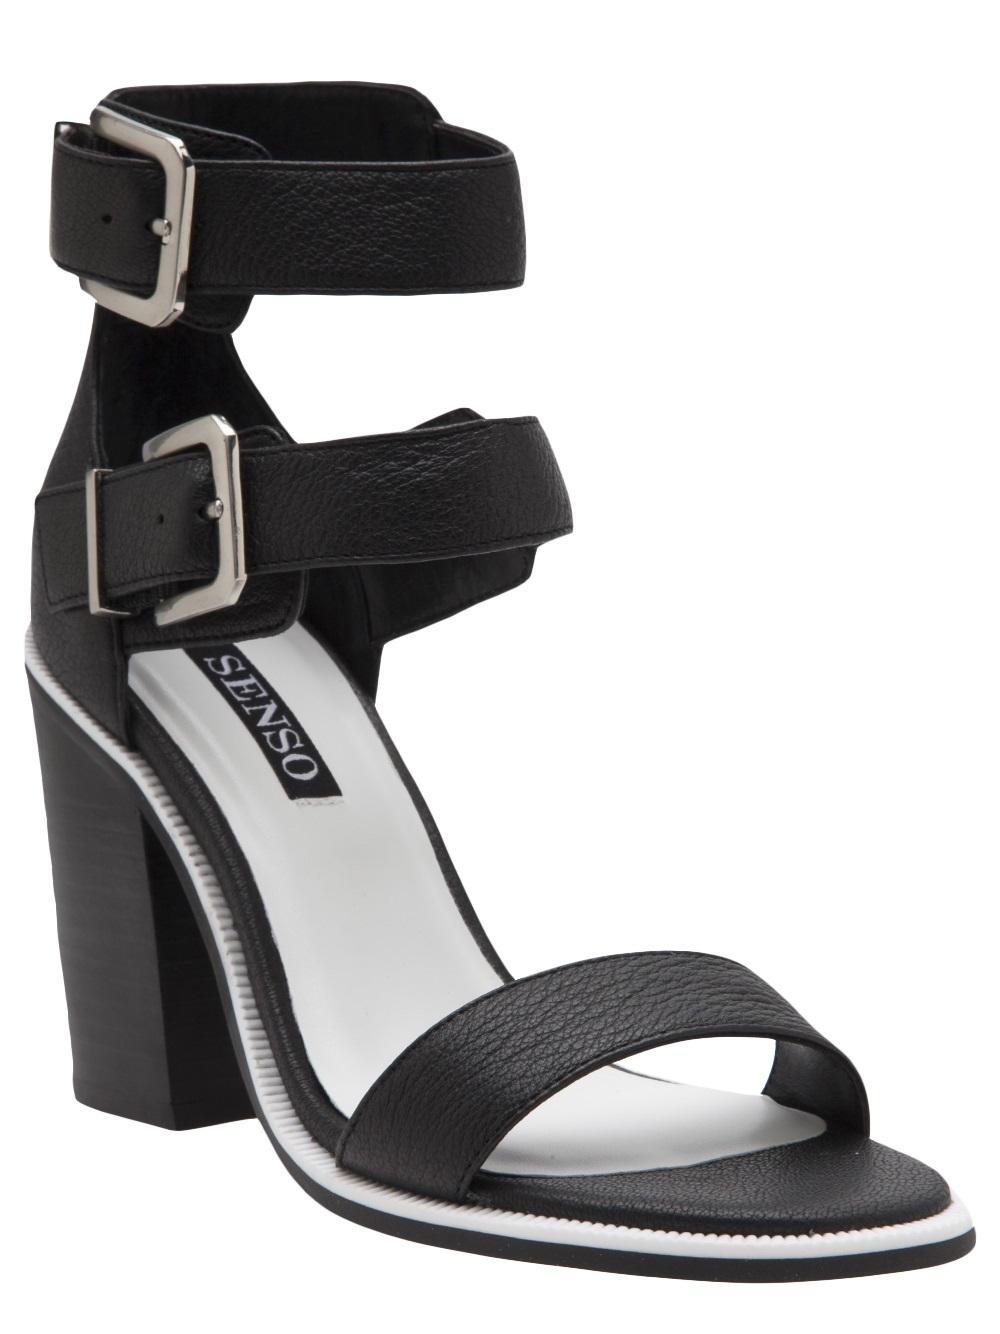 4937aa131f16 Lyst - Senso Robyn Heel in Black